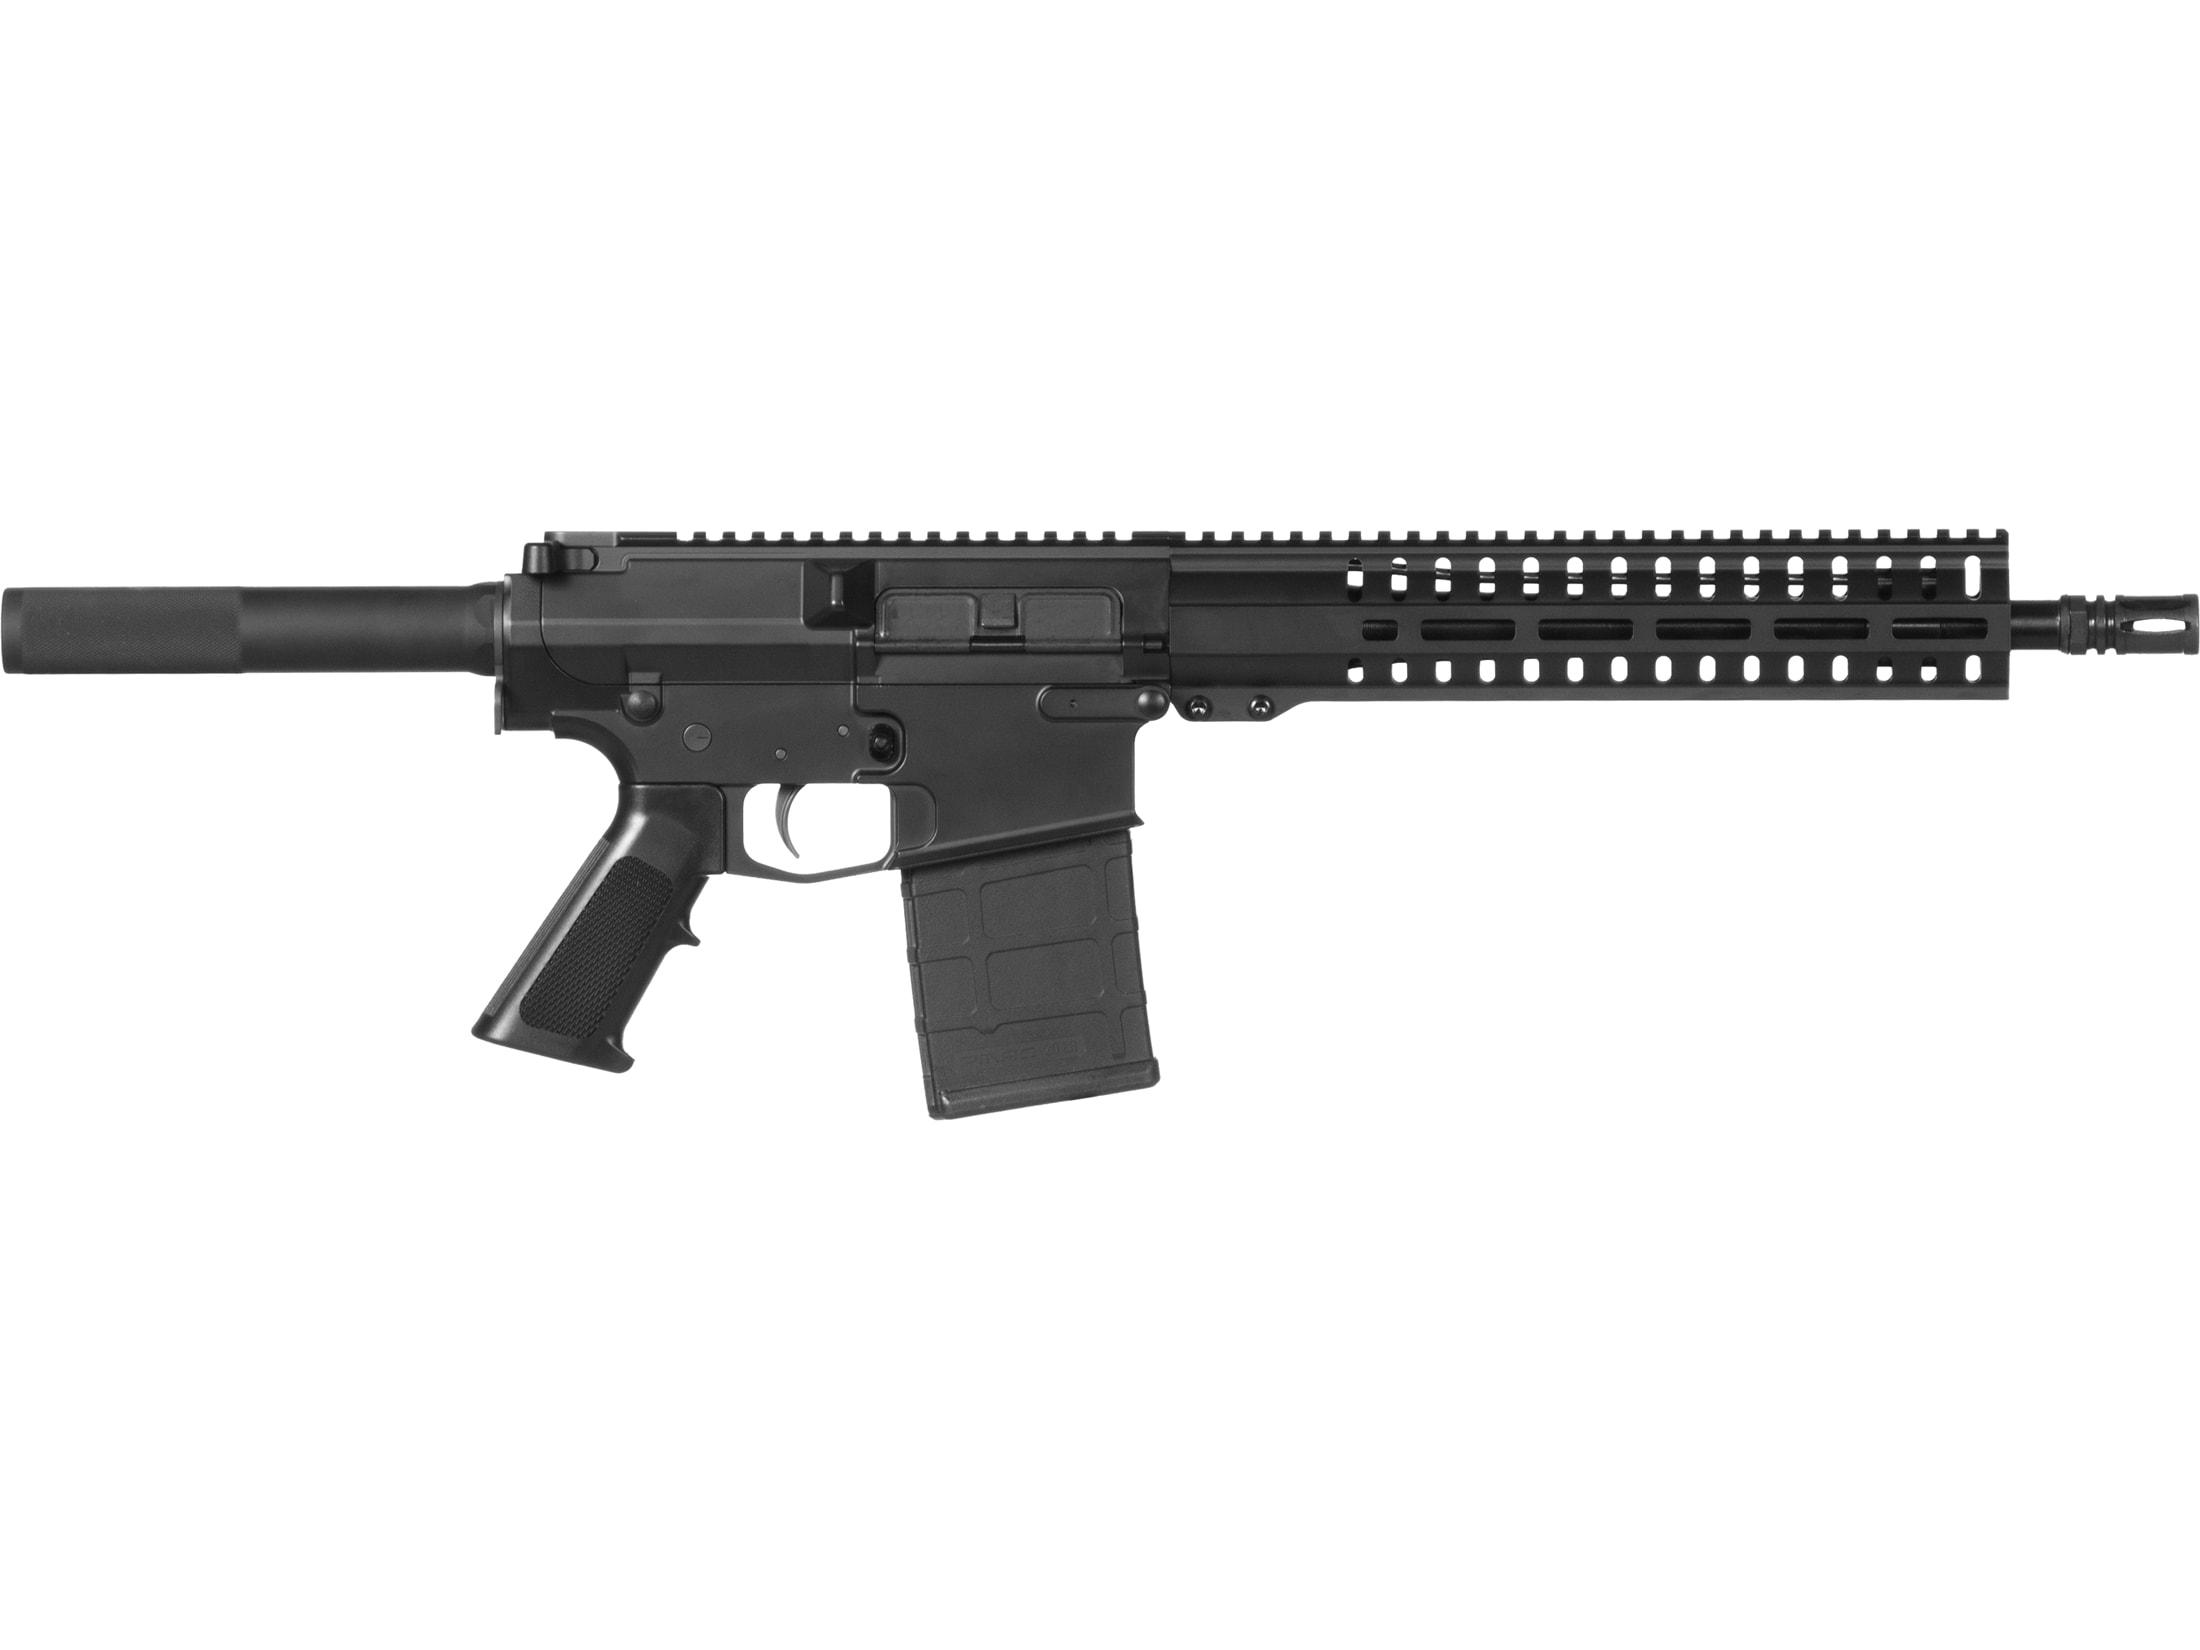 "Image of CMMG Banshee 100 MK3 Pistol 308 Winchester 12.5"" Barrel 20-Round Black"